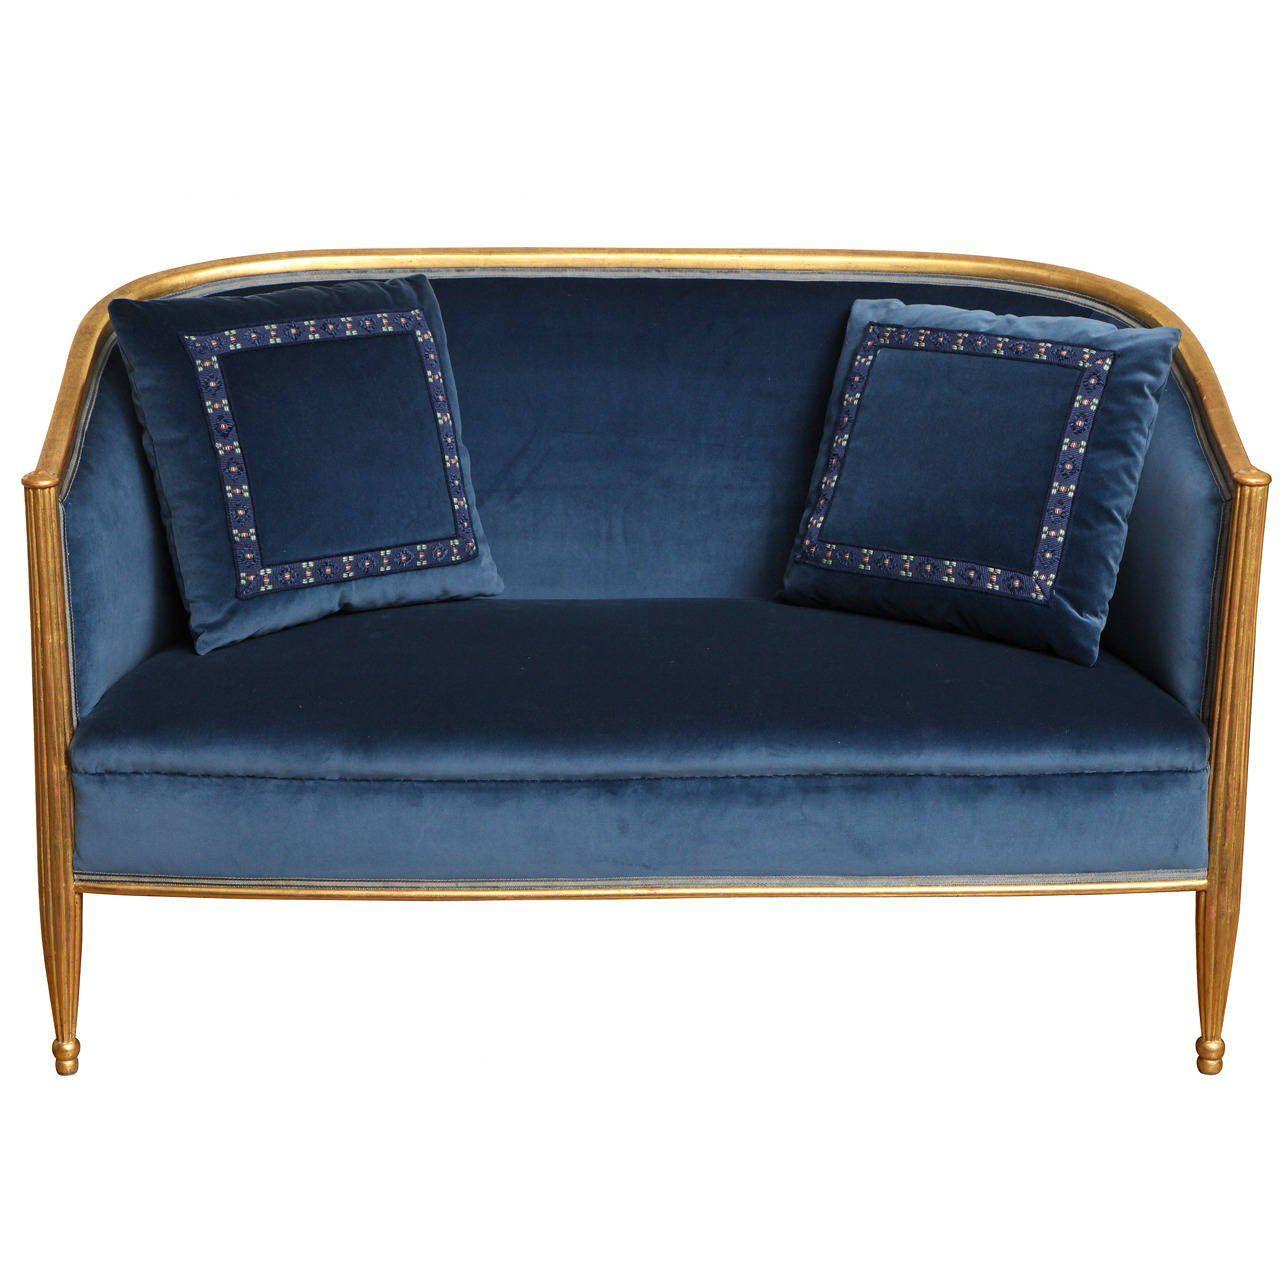 French Art Deco Sofa In The Manner Of Paul Follot Art Deco Sofa